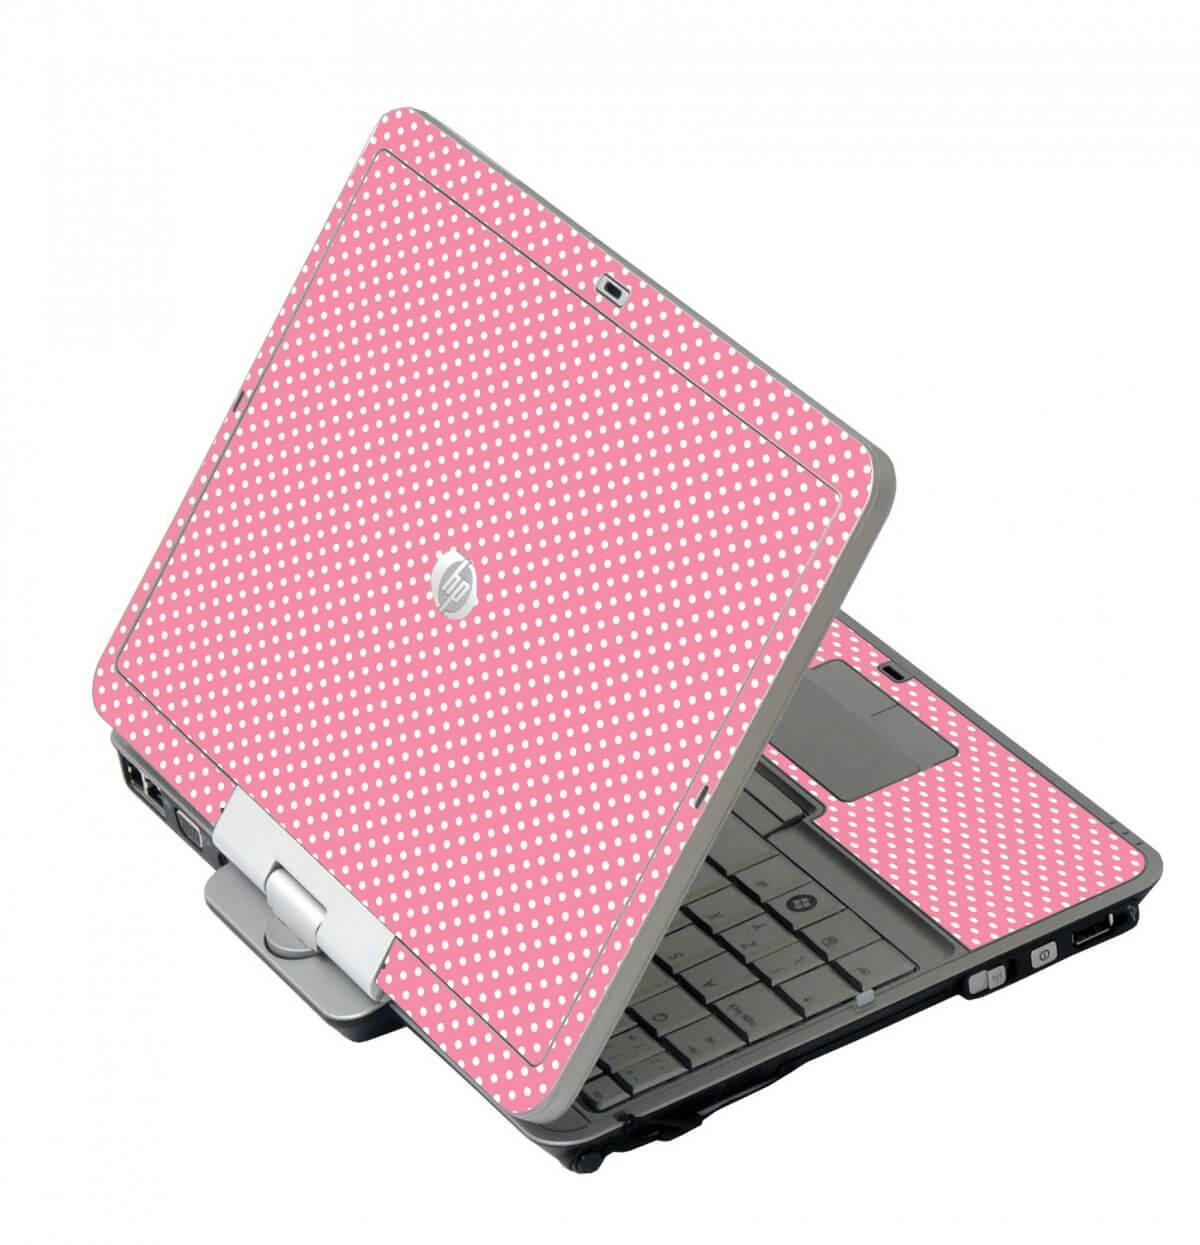 Retro Salmon Polka HP EliteBook 2730P Laptop Skin